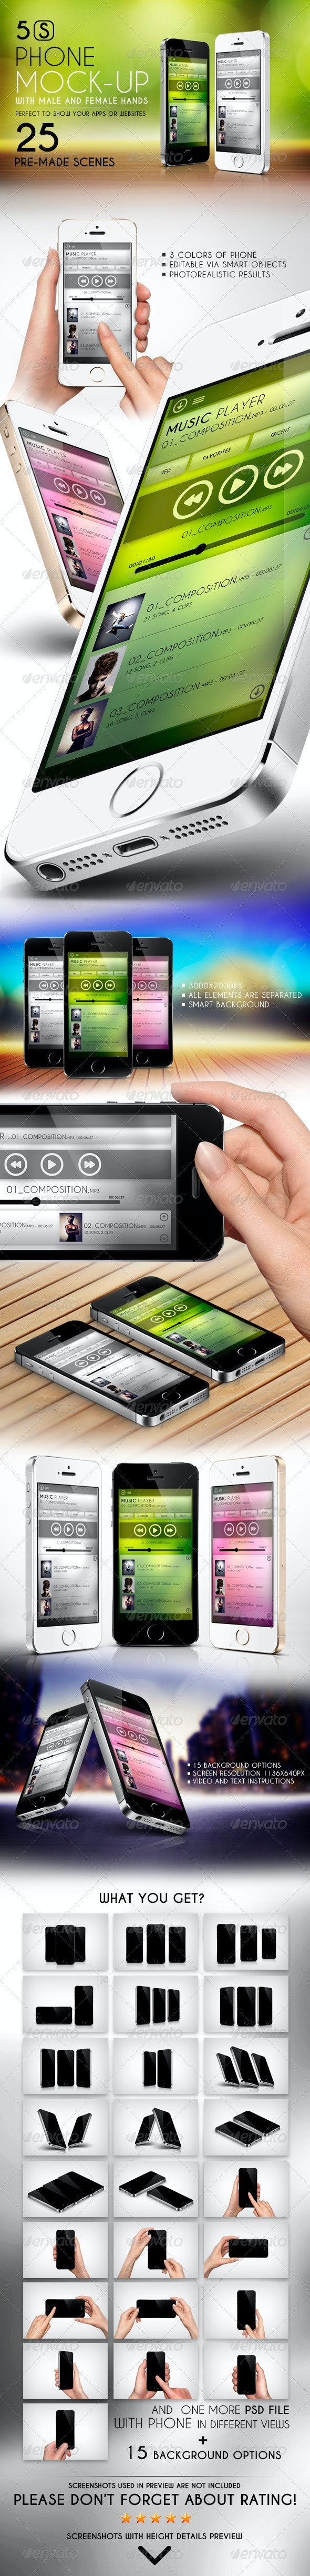 5S Phone Mock-up - Mobile Displays